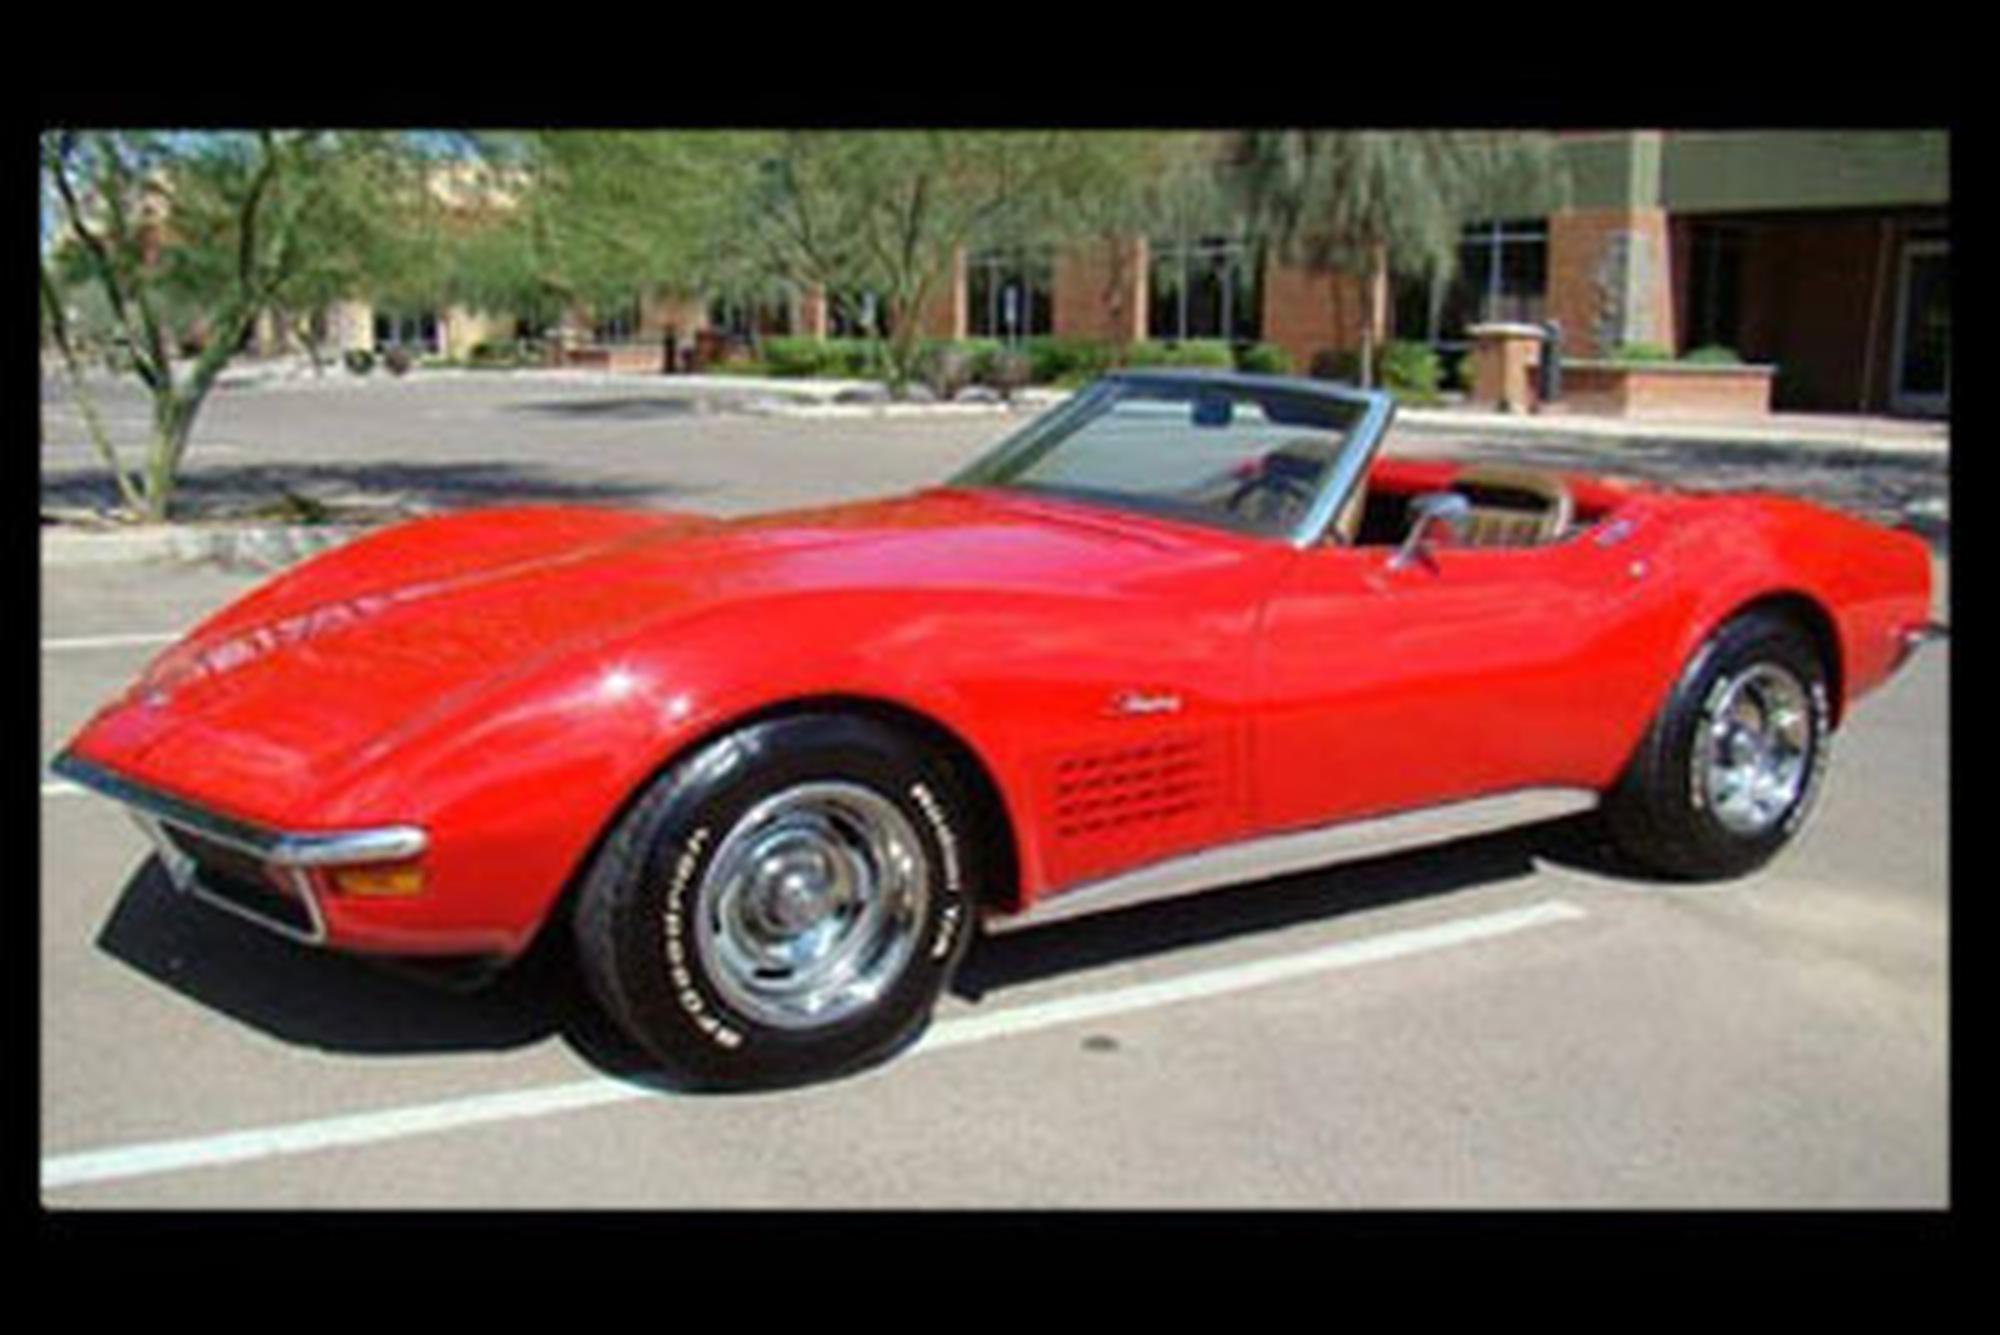 Rent Corvette Stingray >> 1971 Corvette Convertible Stingray For Rent In Malta Malta Rentals